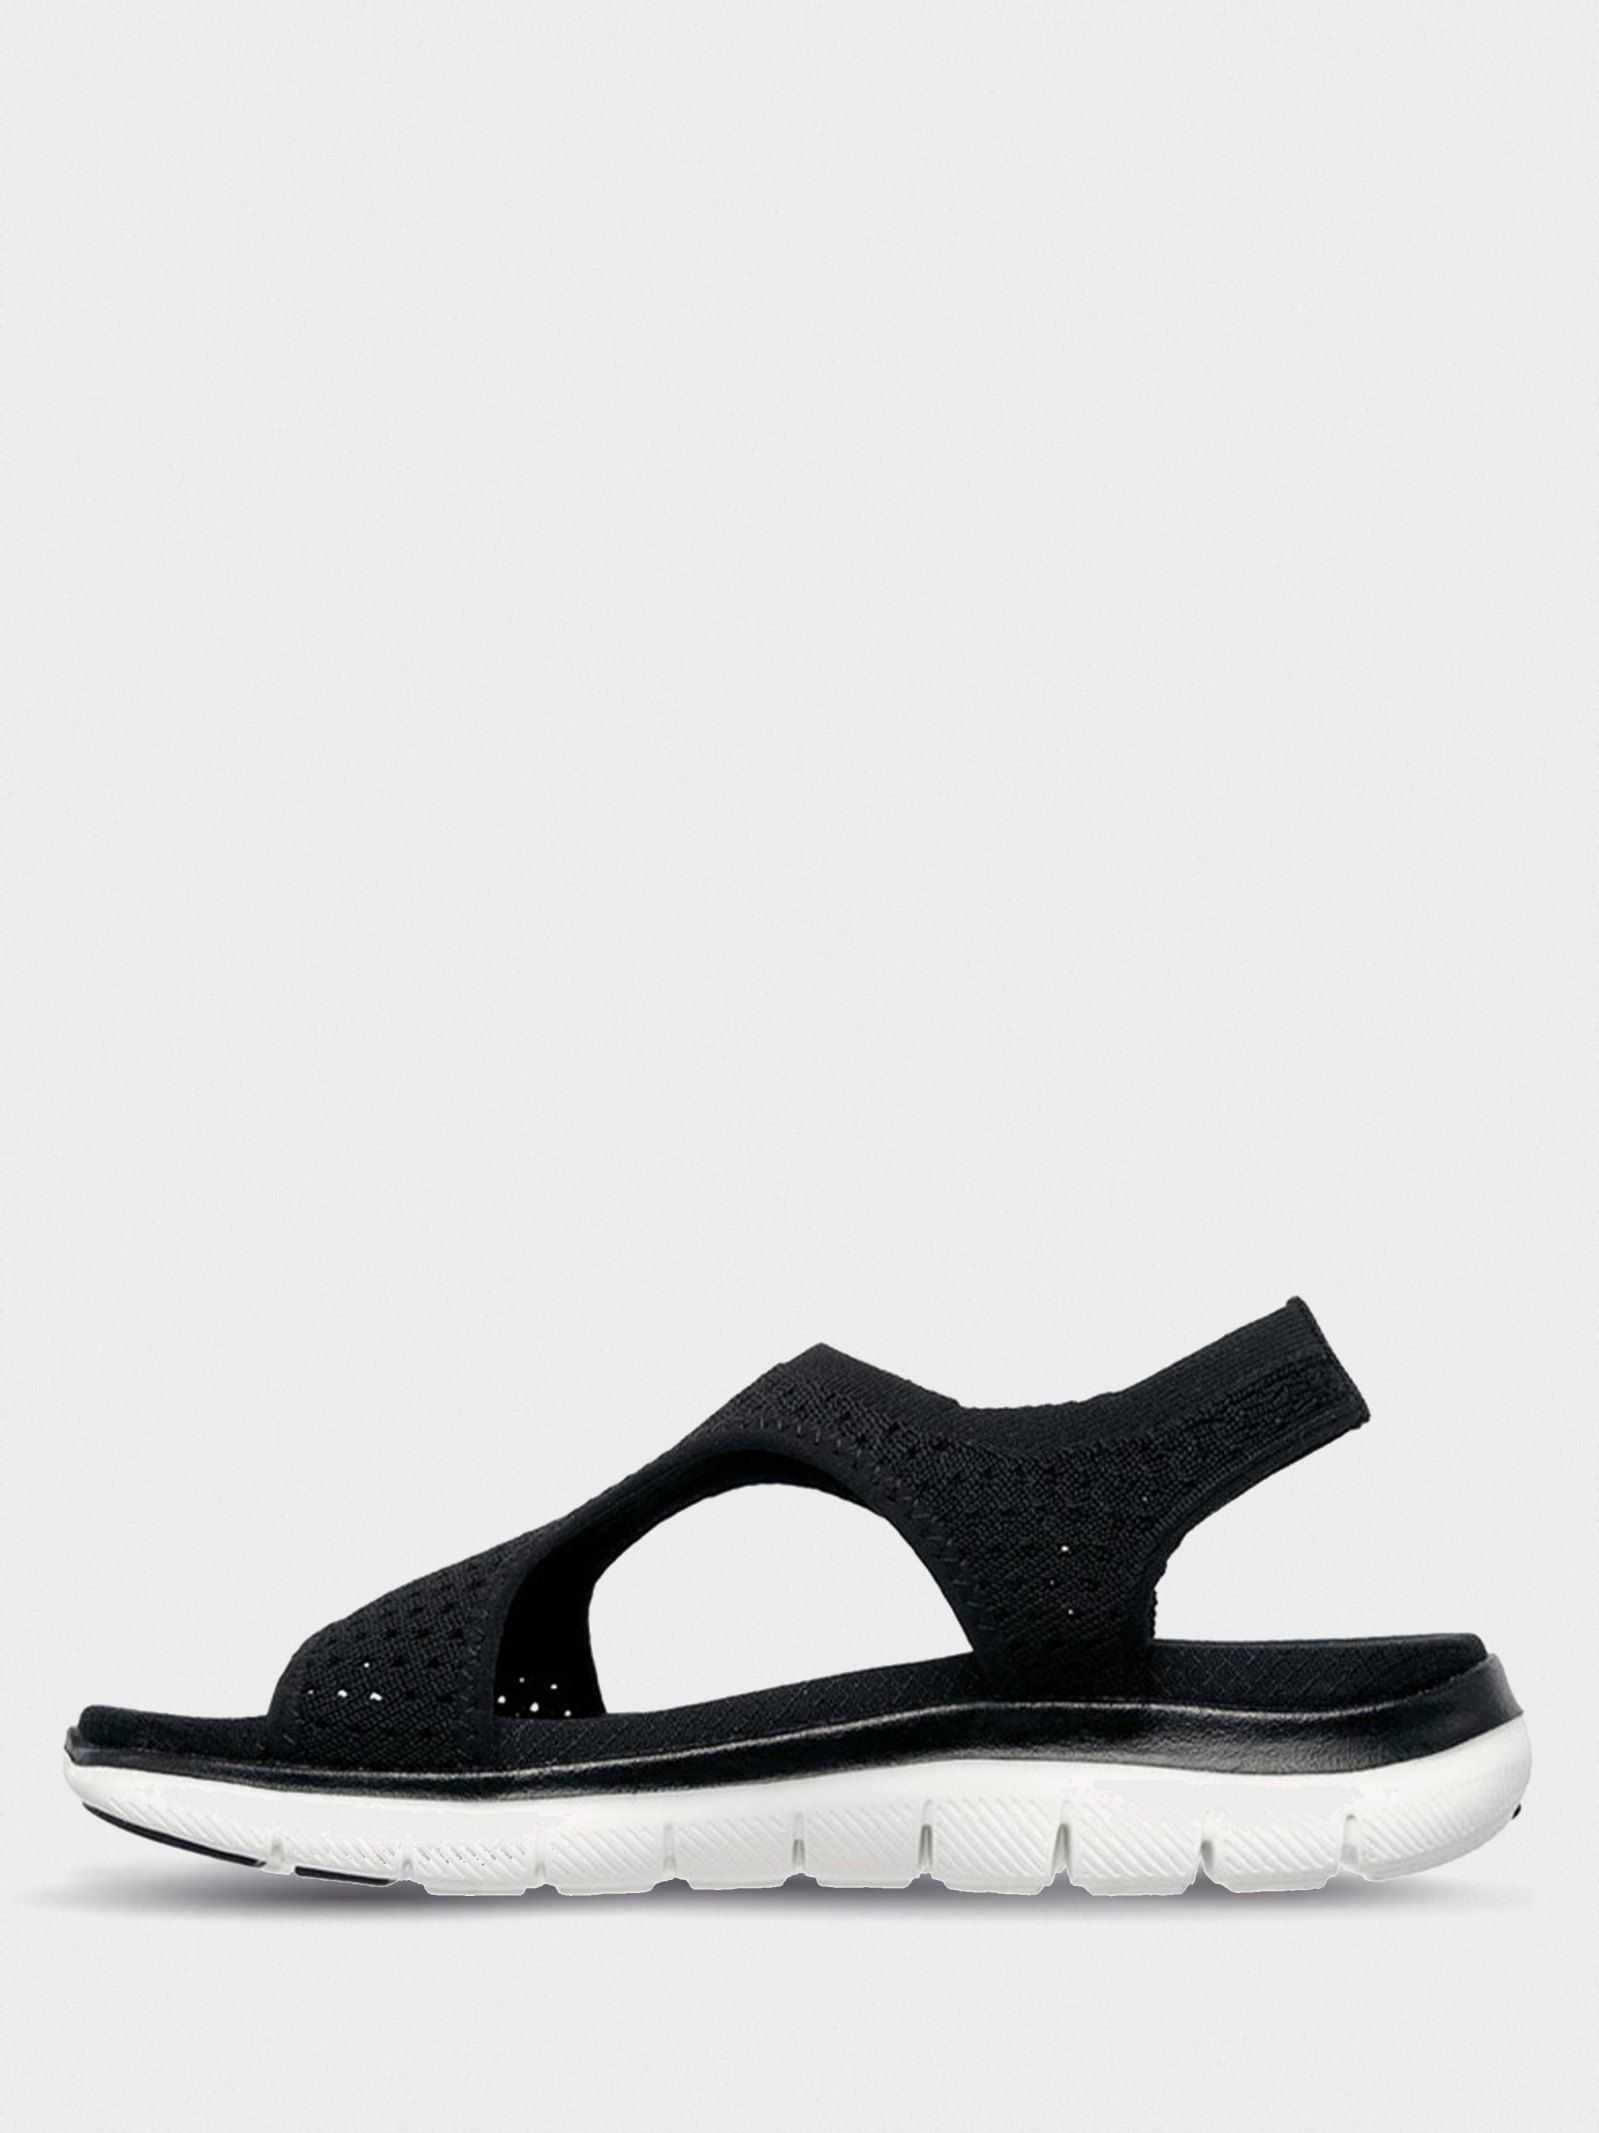 Сандалі  для жінок Skechers 31674 BLK модне взуття, 2017